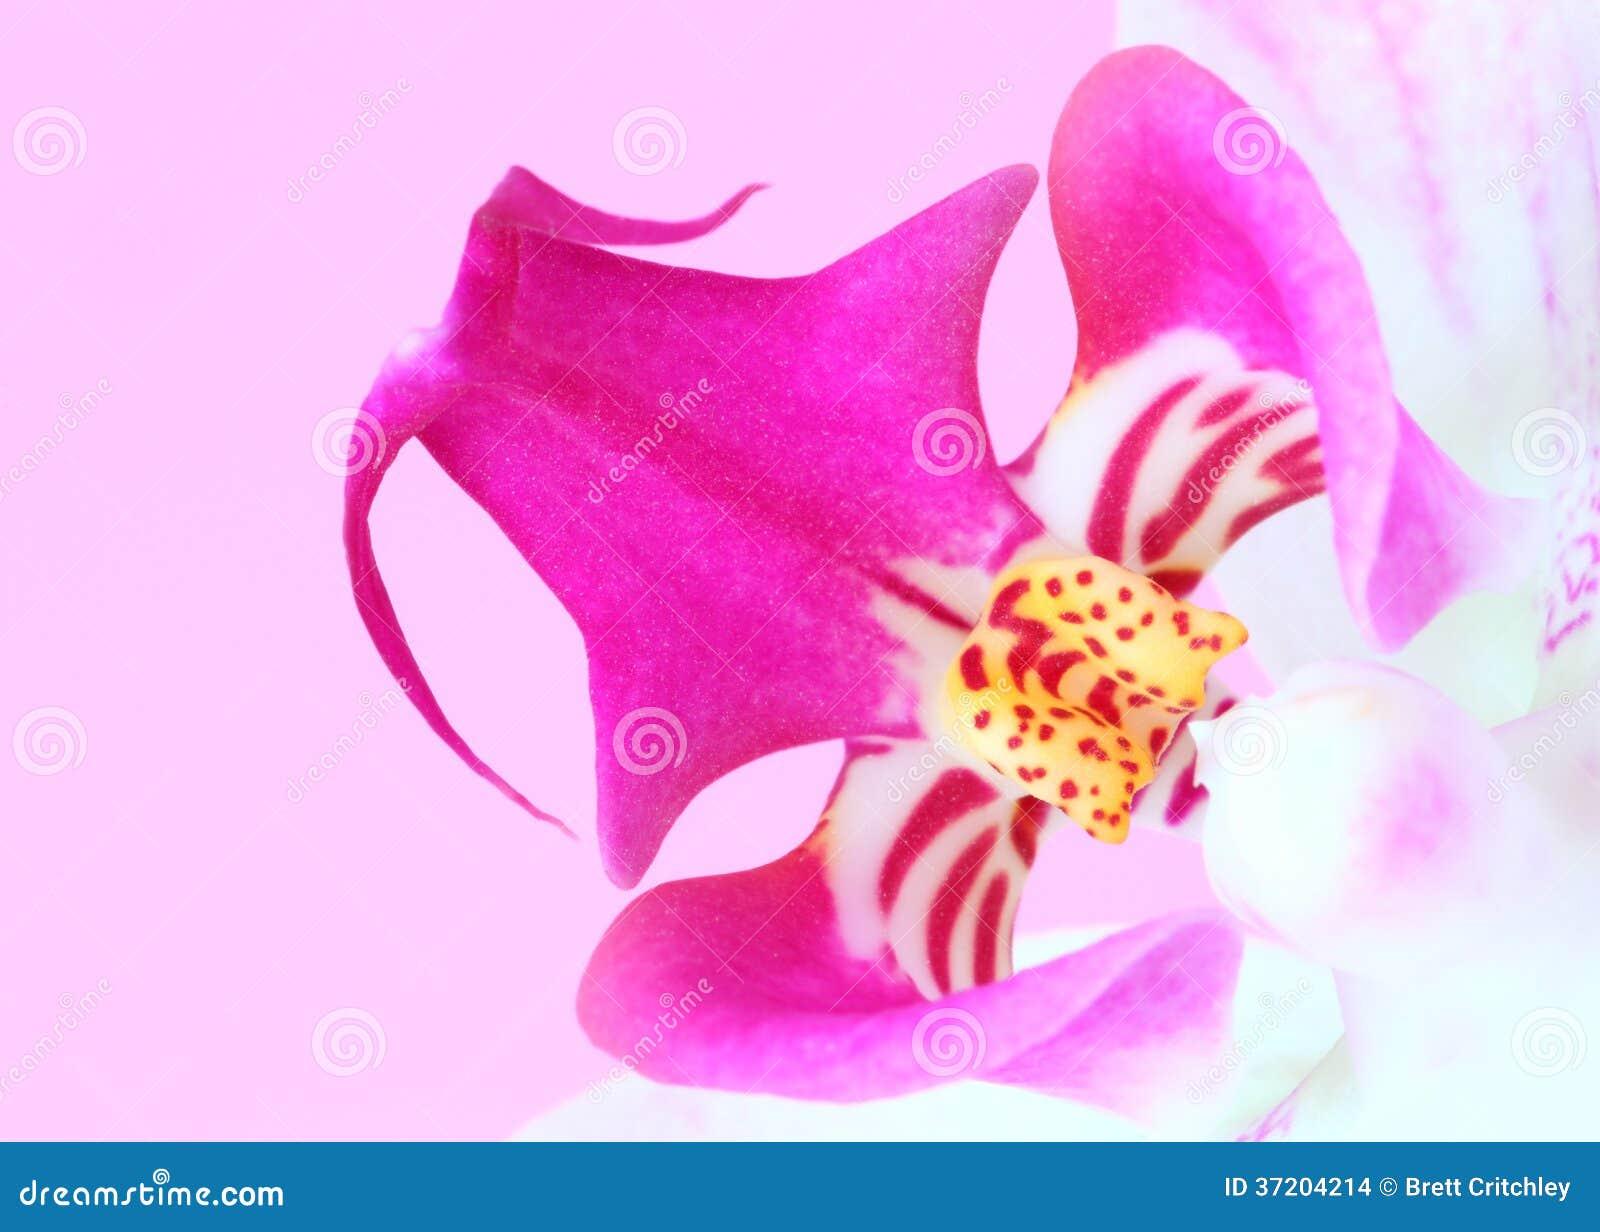 Close up flower stock photo. Image of closeup, carpel - 37204214